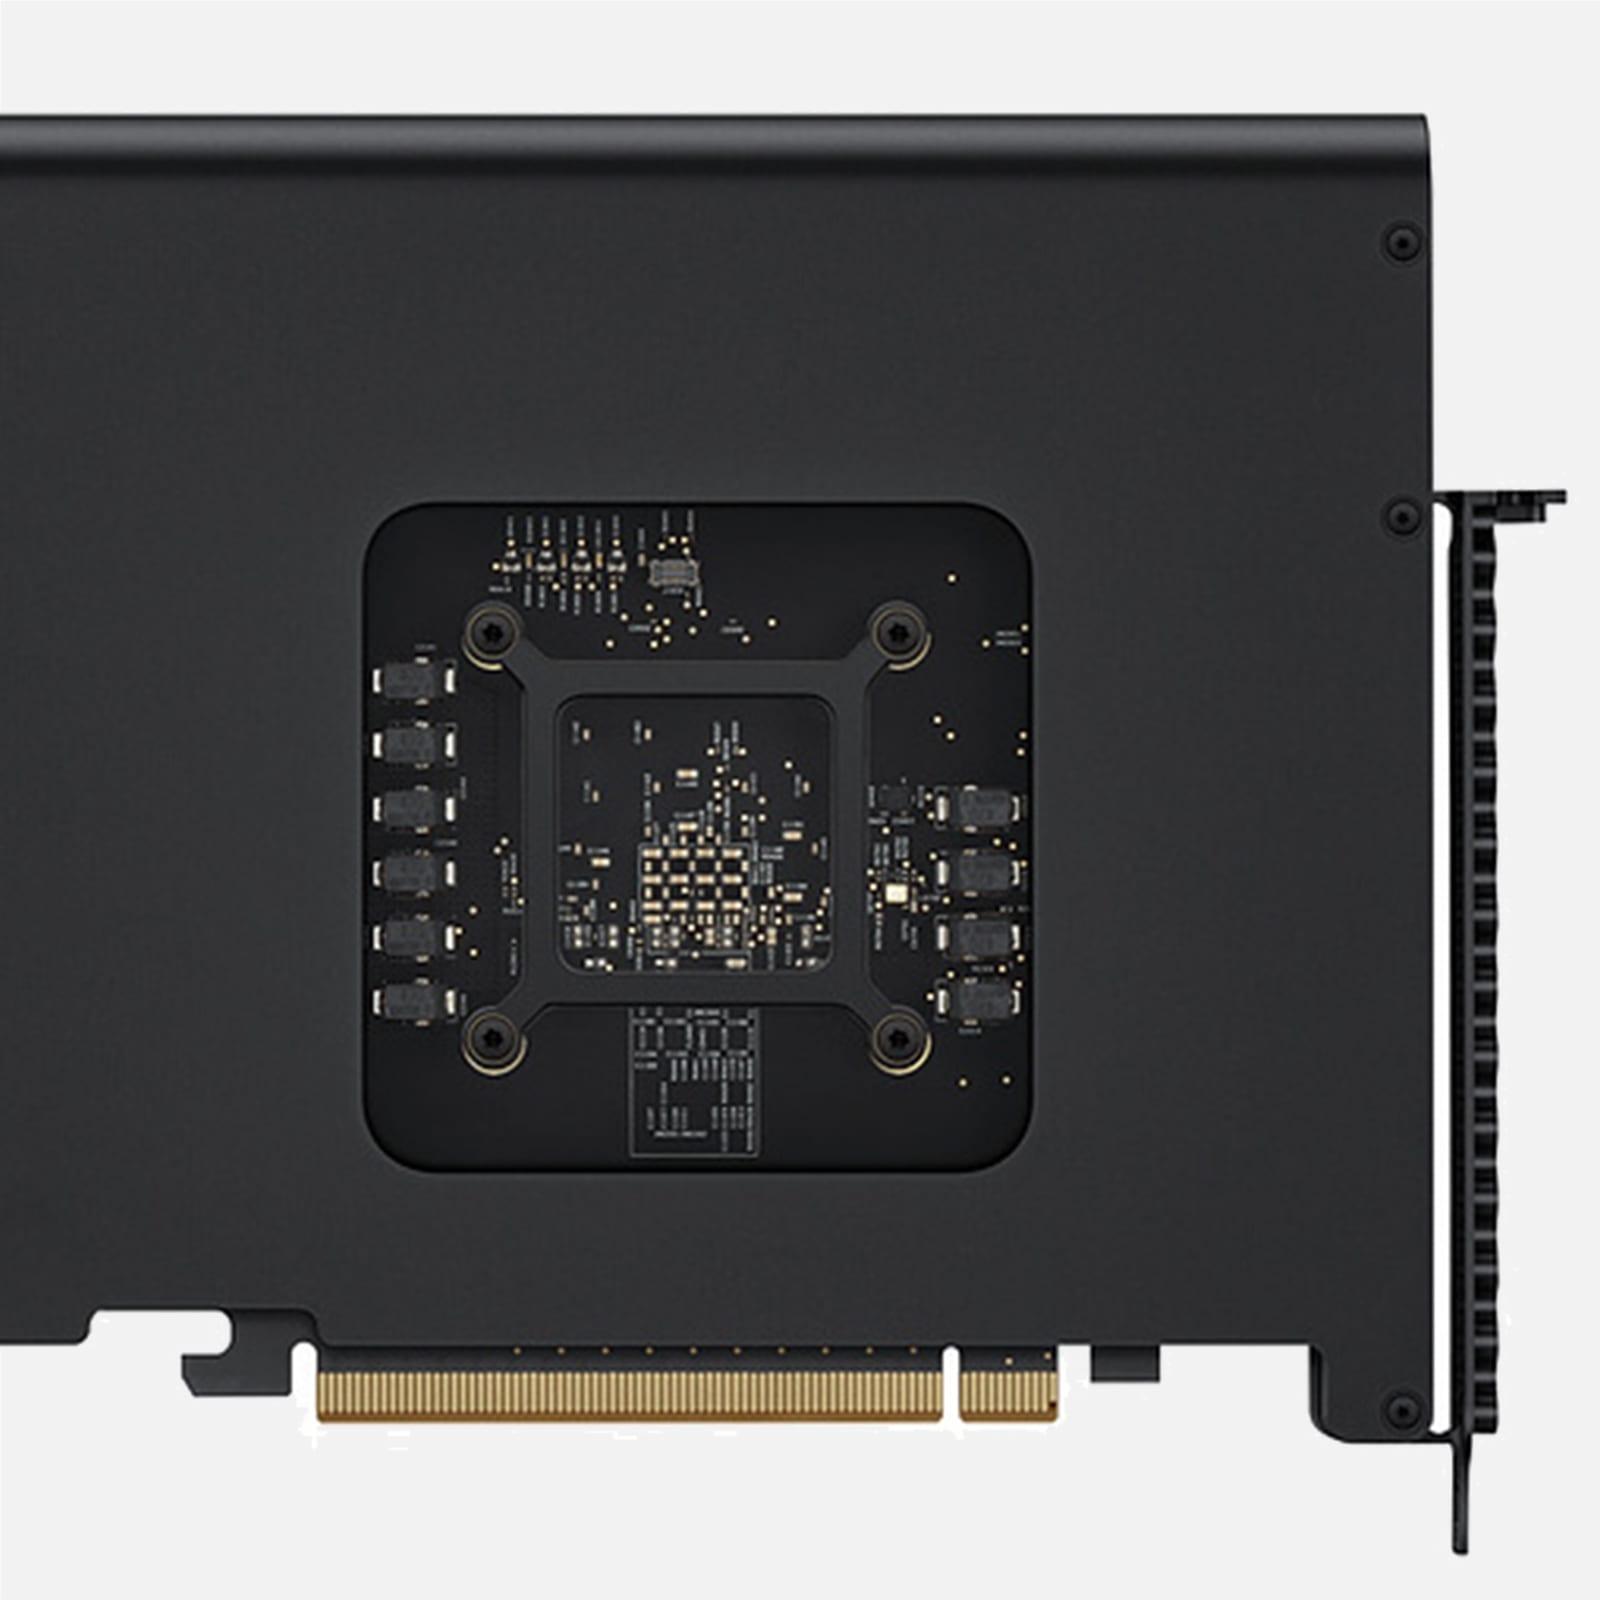 1 x Apple Afterburner Card